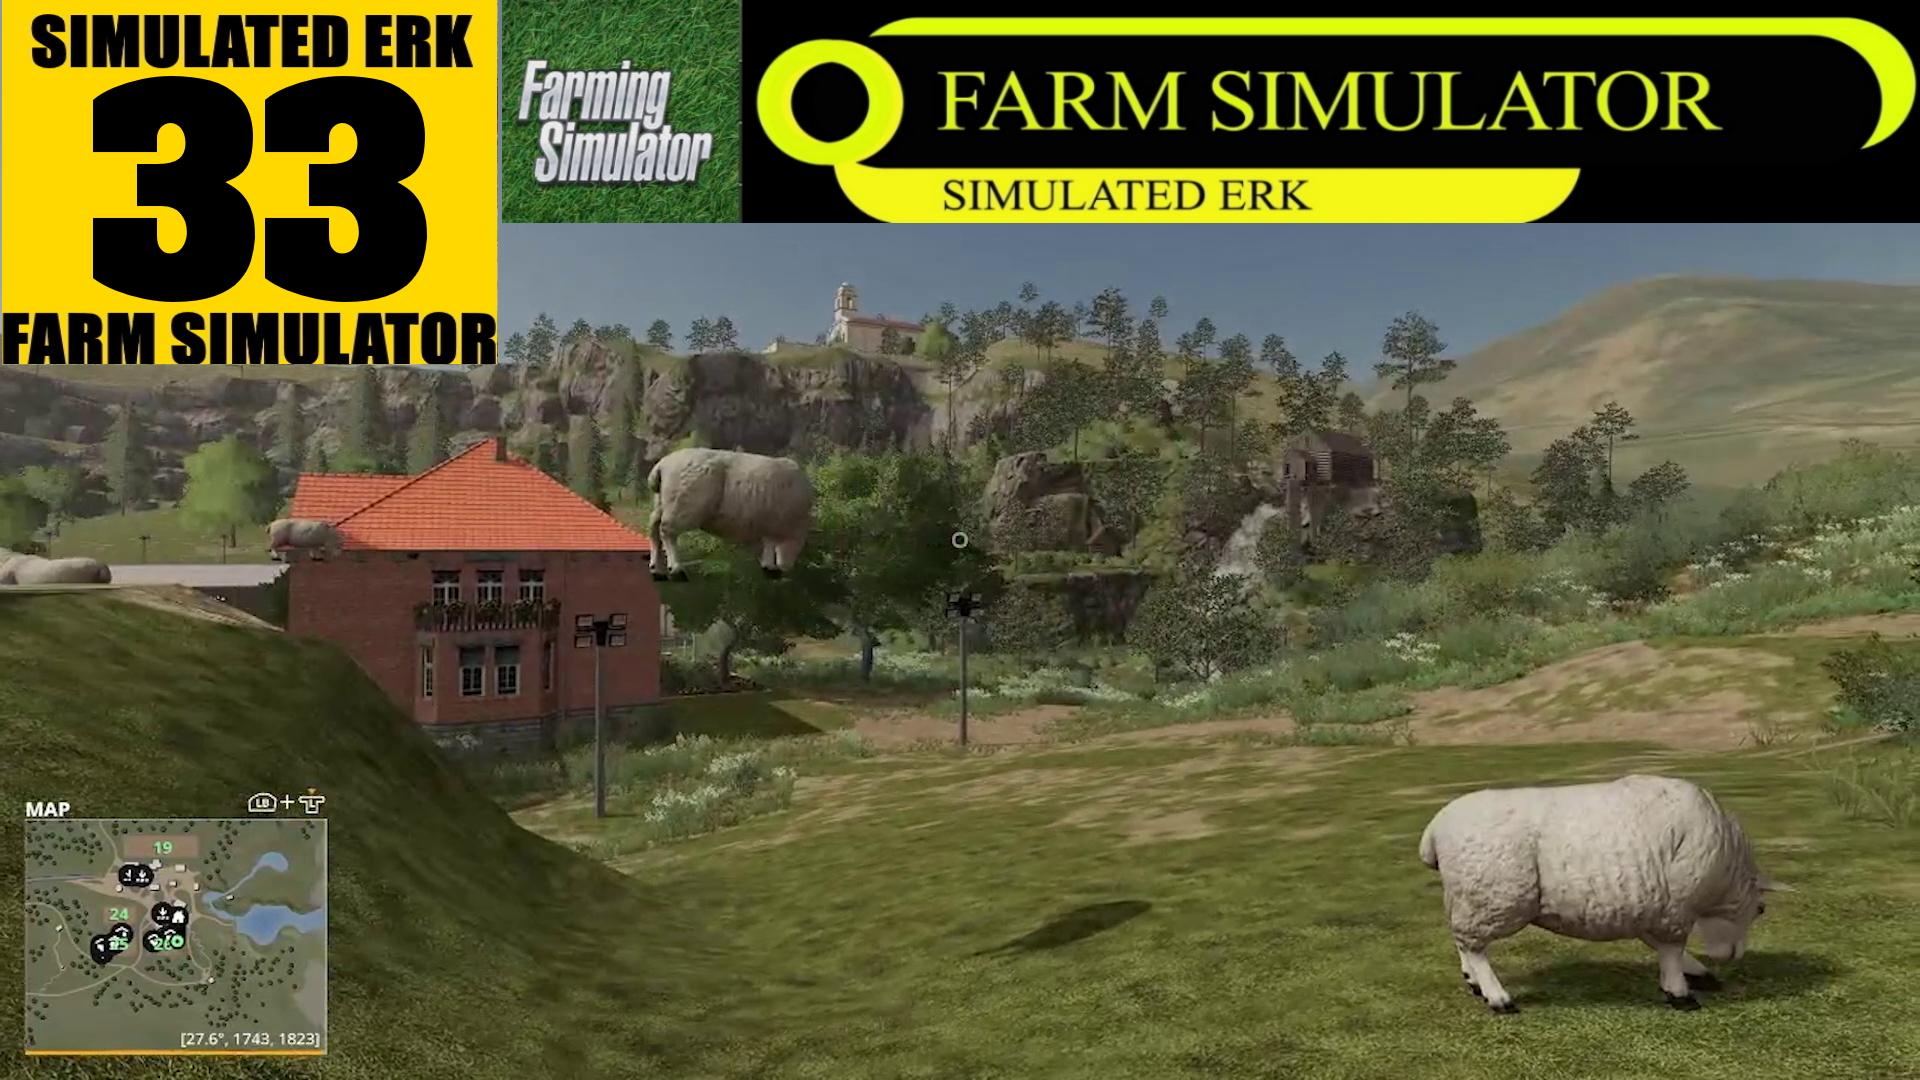 Simulated Erk: Farm Simulator episode 33 | This Isn't Landscape Simulator!